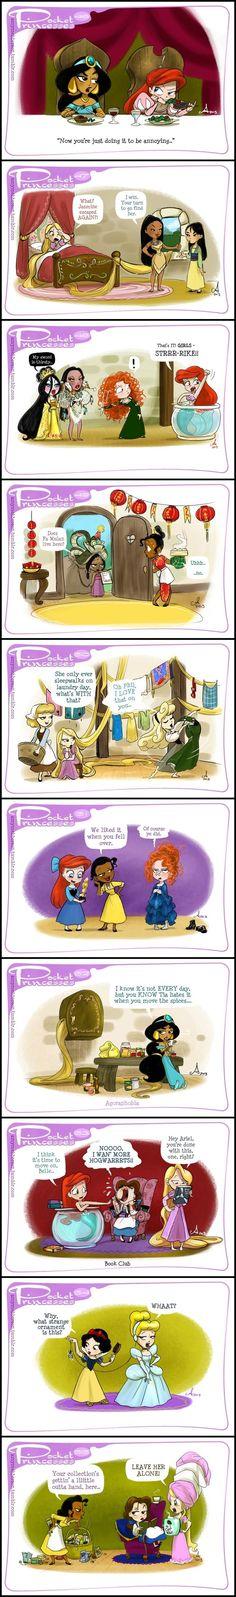 38 Ideas Funny Disney Comics Pocket Princesses Rapunzel For 2019 Disney Pixar, Walt Disney, Cute Disney, Disney Dream, Disney Girls, Disney Cartoons, Disney And Dreamworks, Disney Magic, Funny Disney